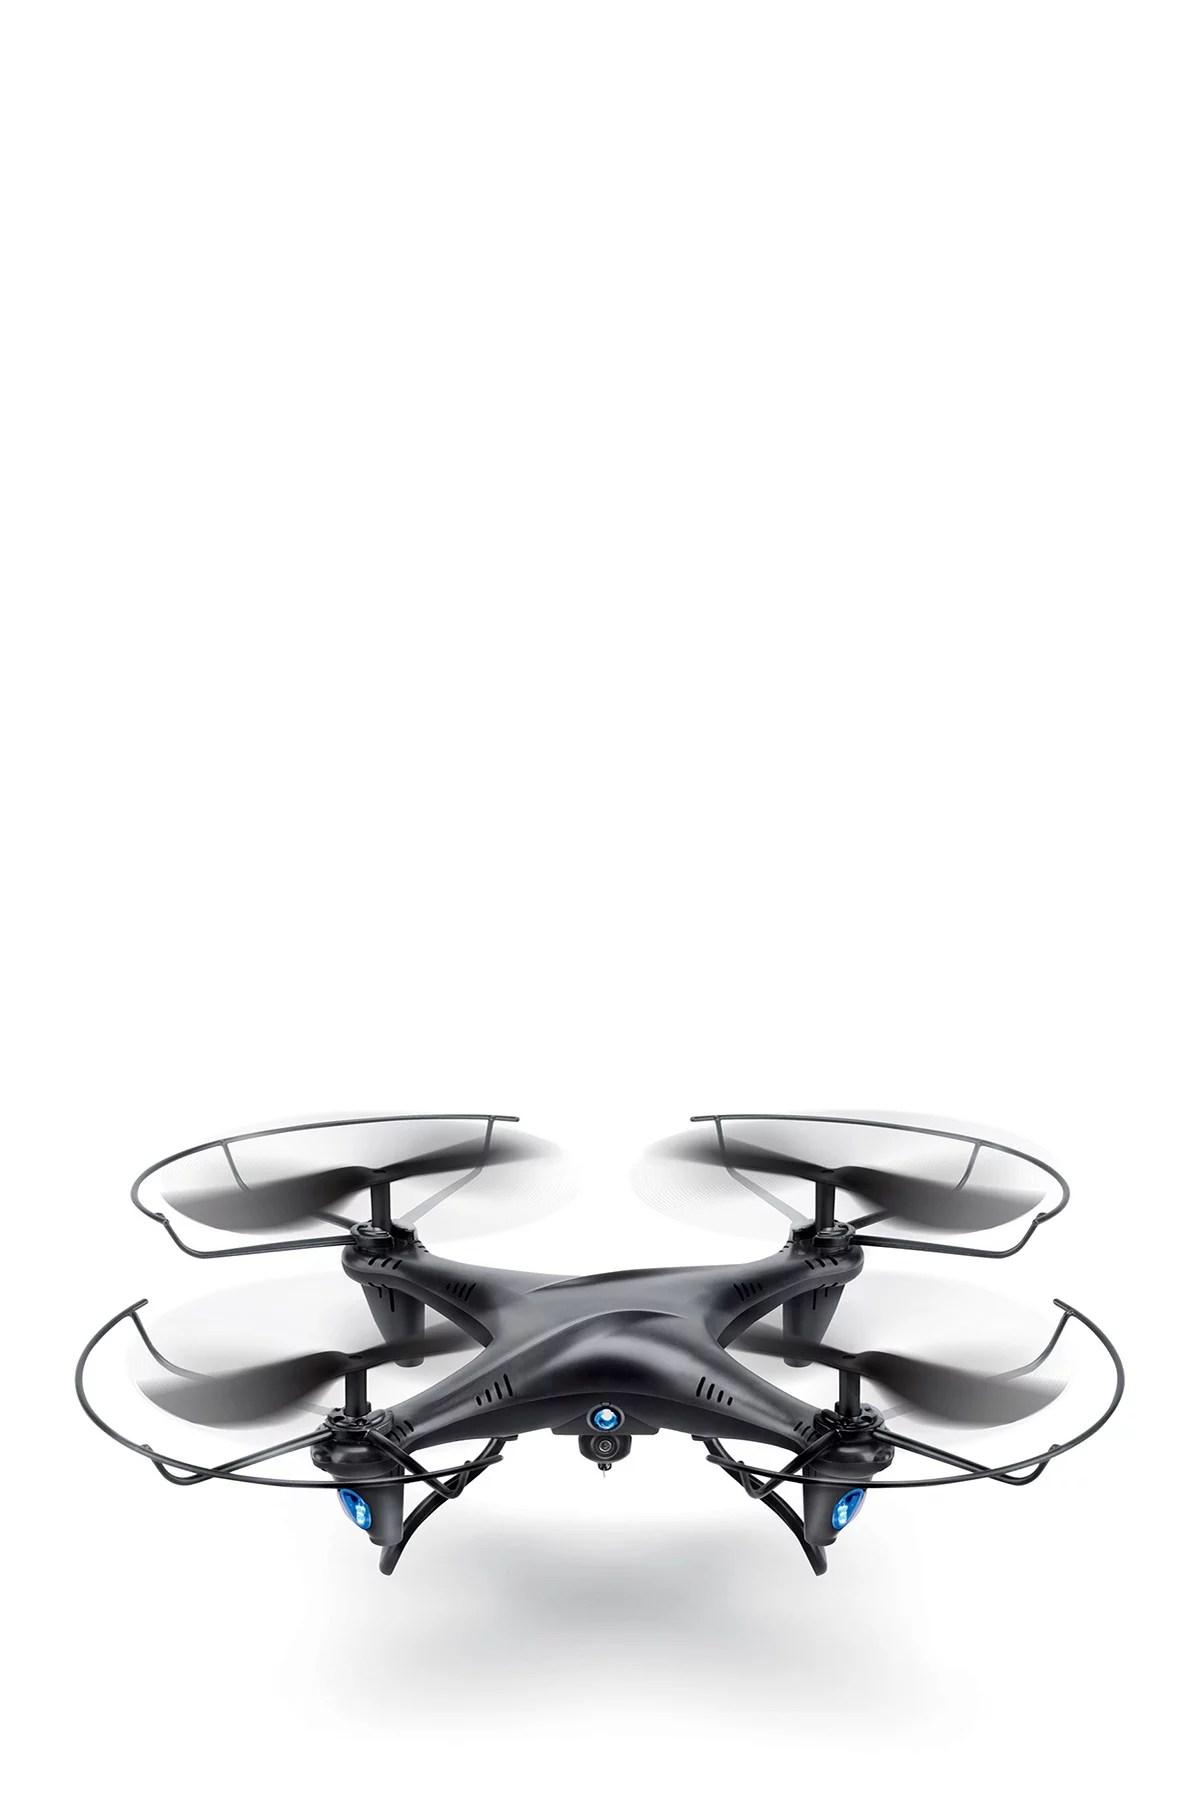 Avier Drone : avier, drone, Merkury, Avier, Stealth, Quadcopter, Drone, Wi-Fi, Camera, Walmart.com